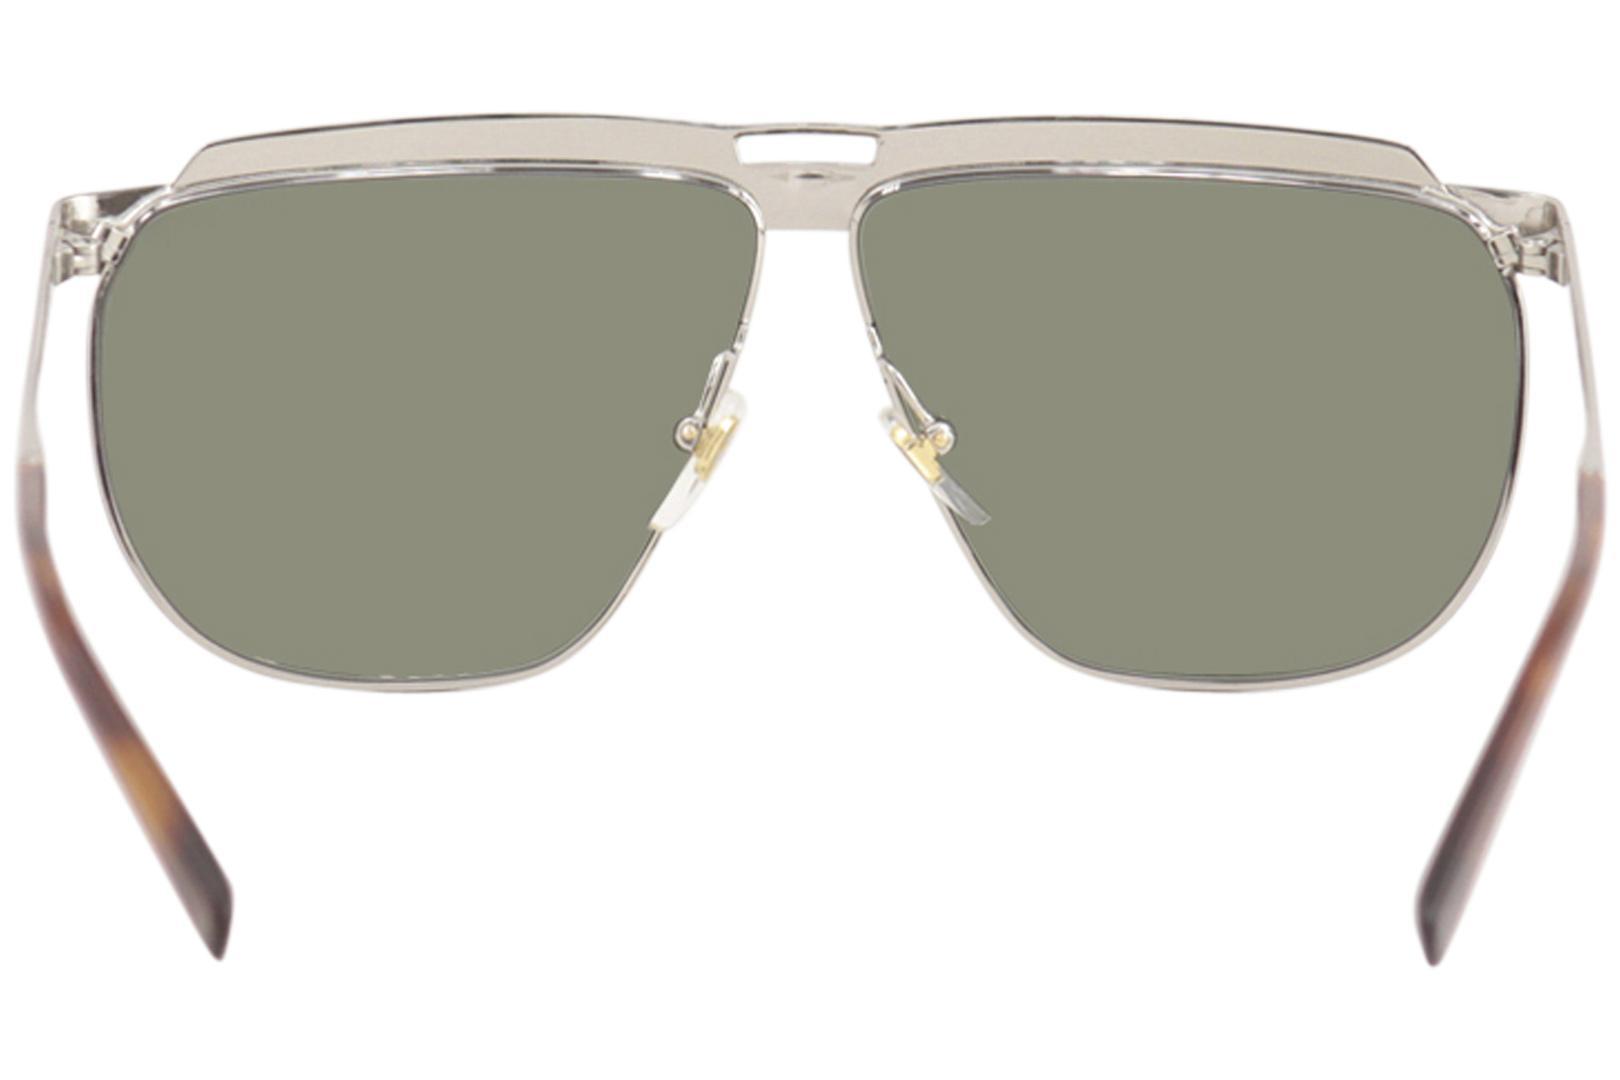 c4523dd414e9c MCM Men s MCM113S MCM 113 S Fashion Pilot Sunglasses